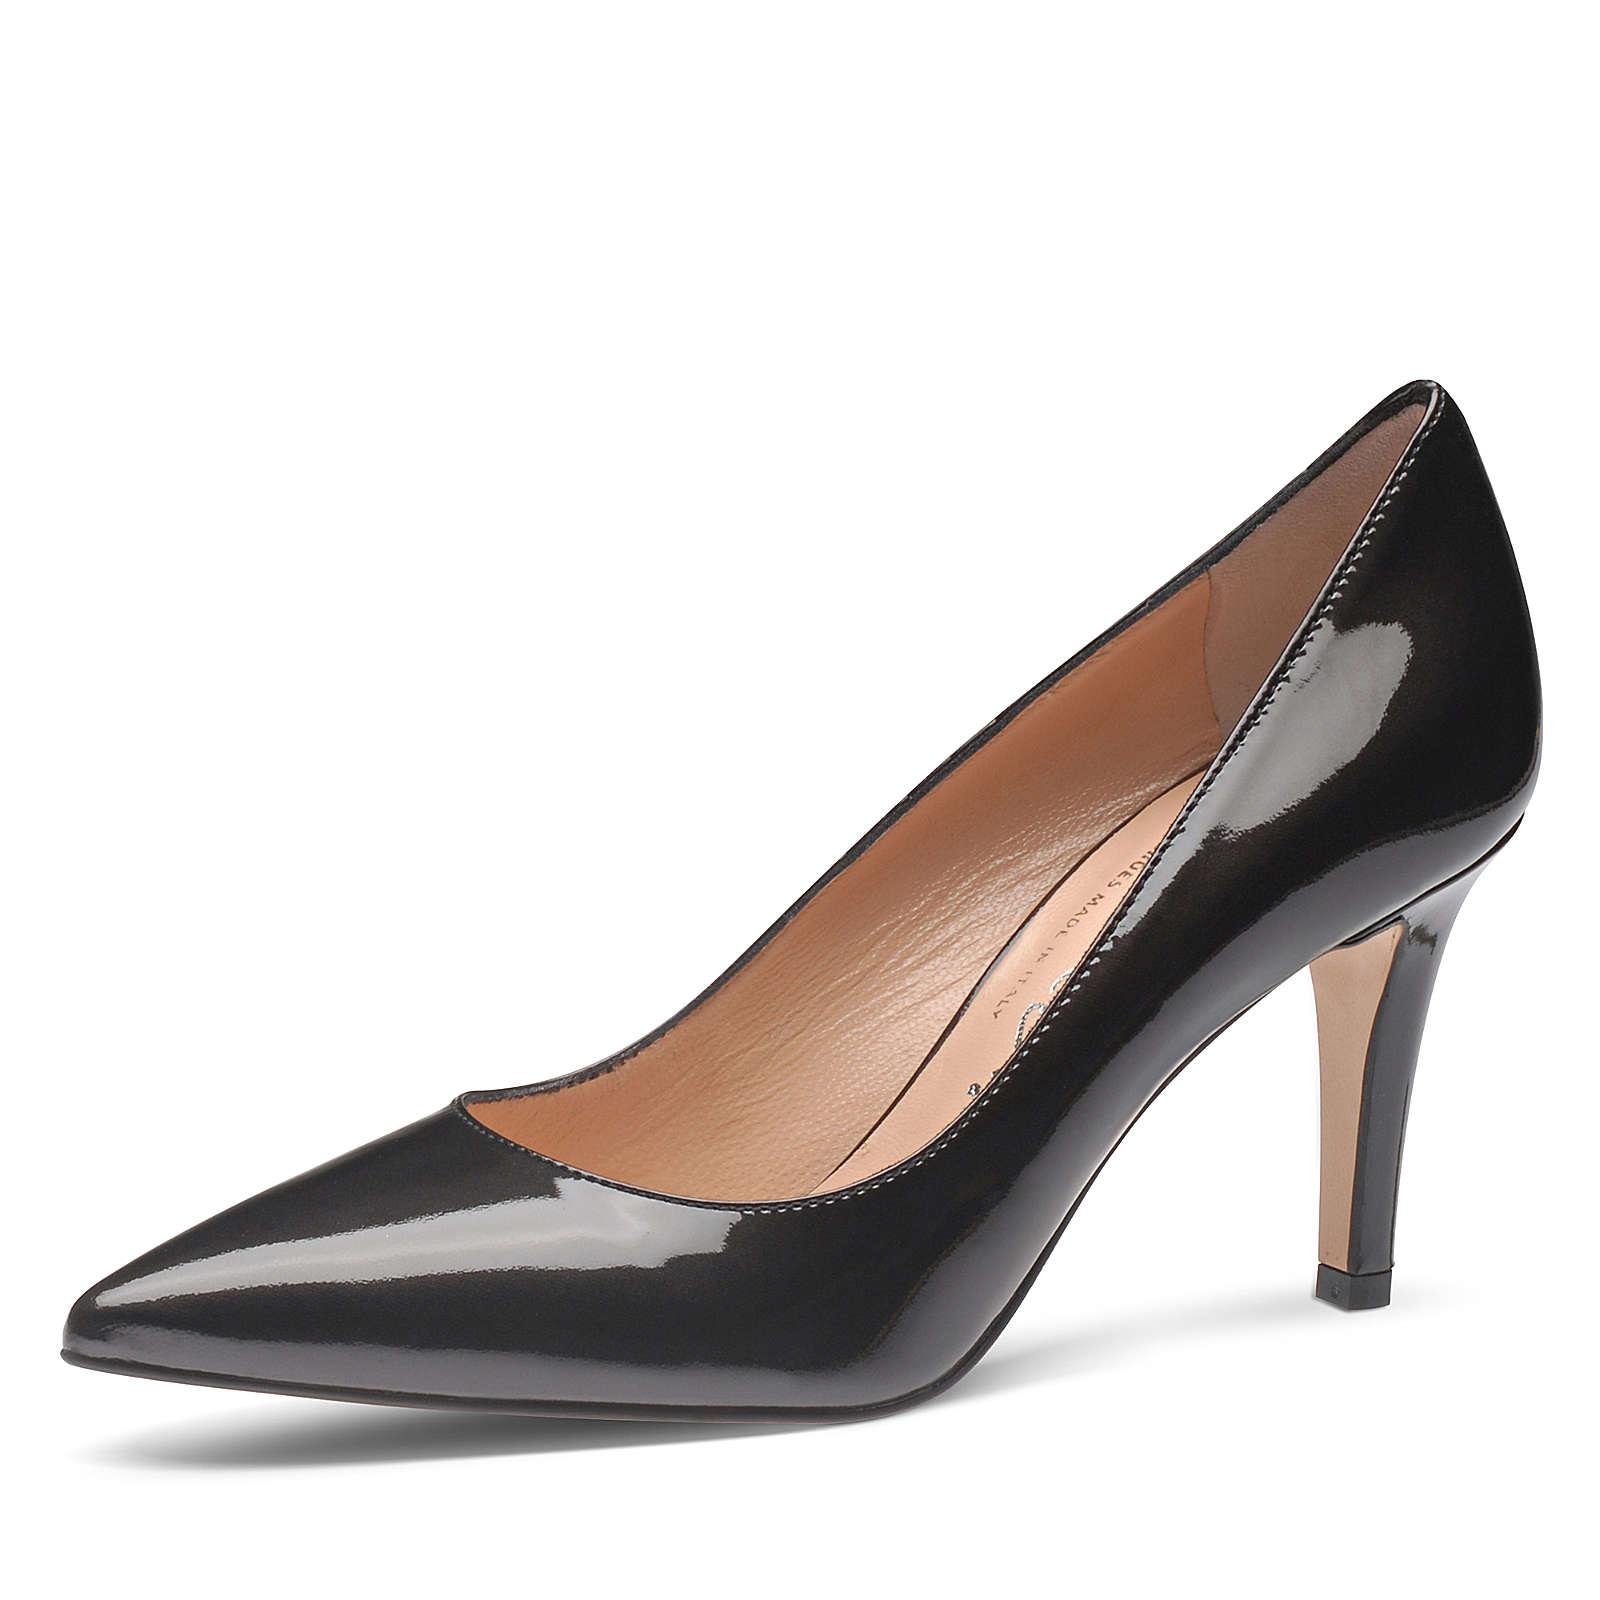 Evita Shoes Pumps schwarz Damen Gr. 35